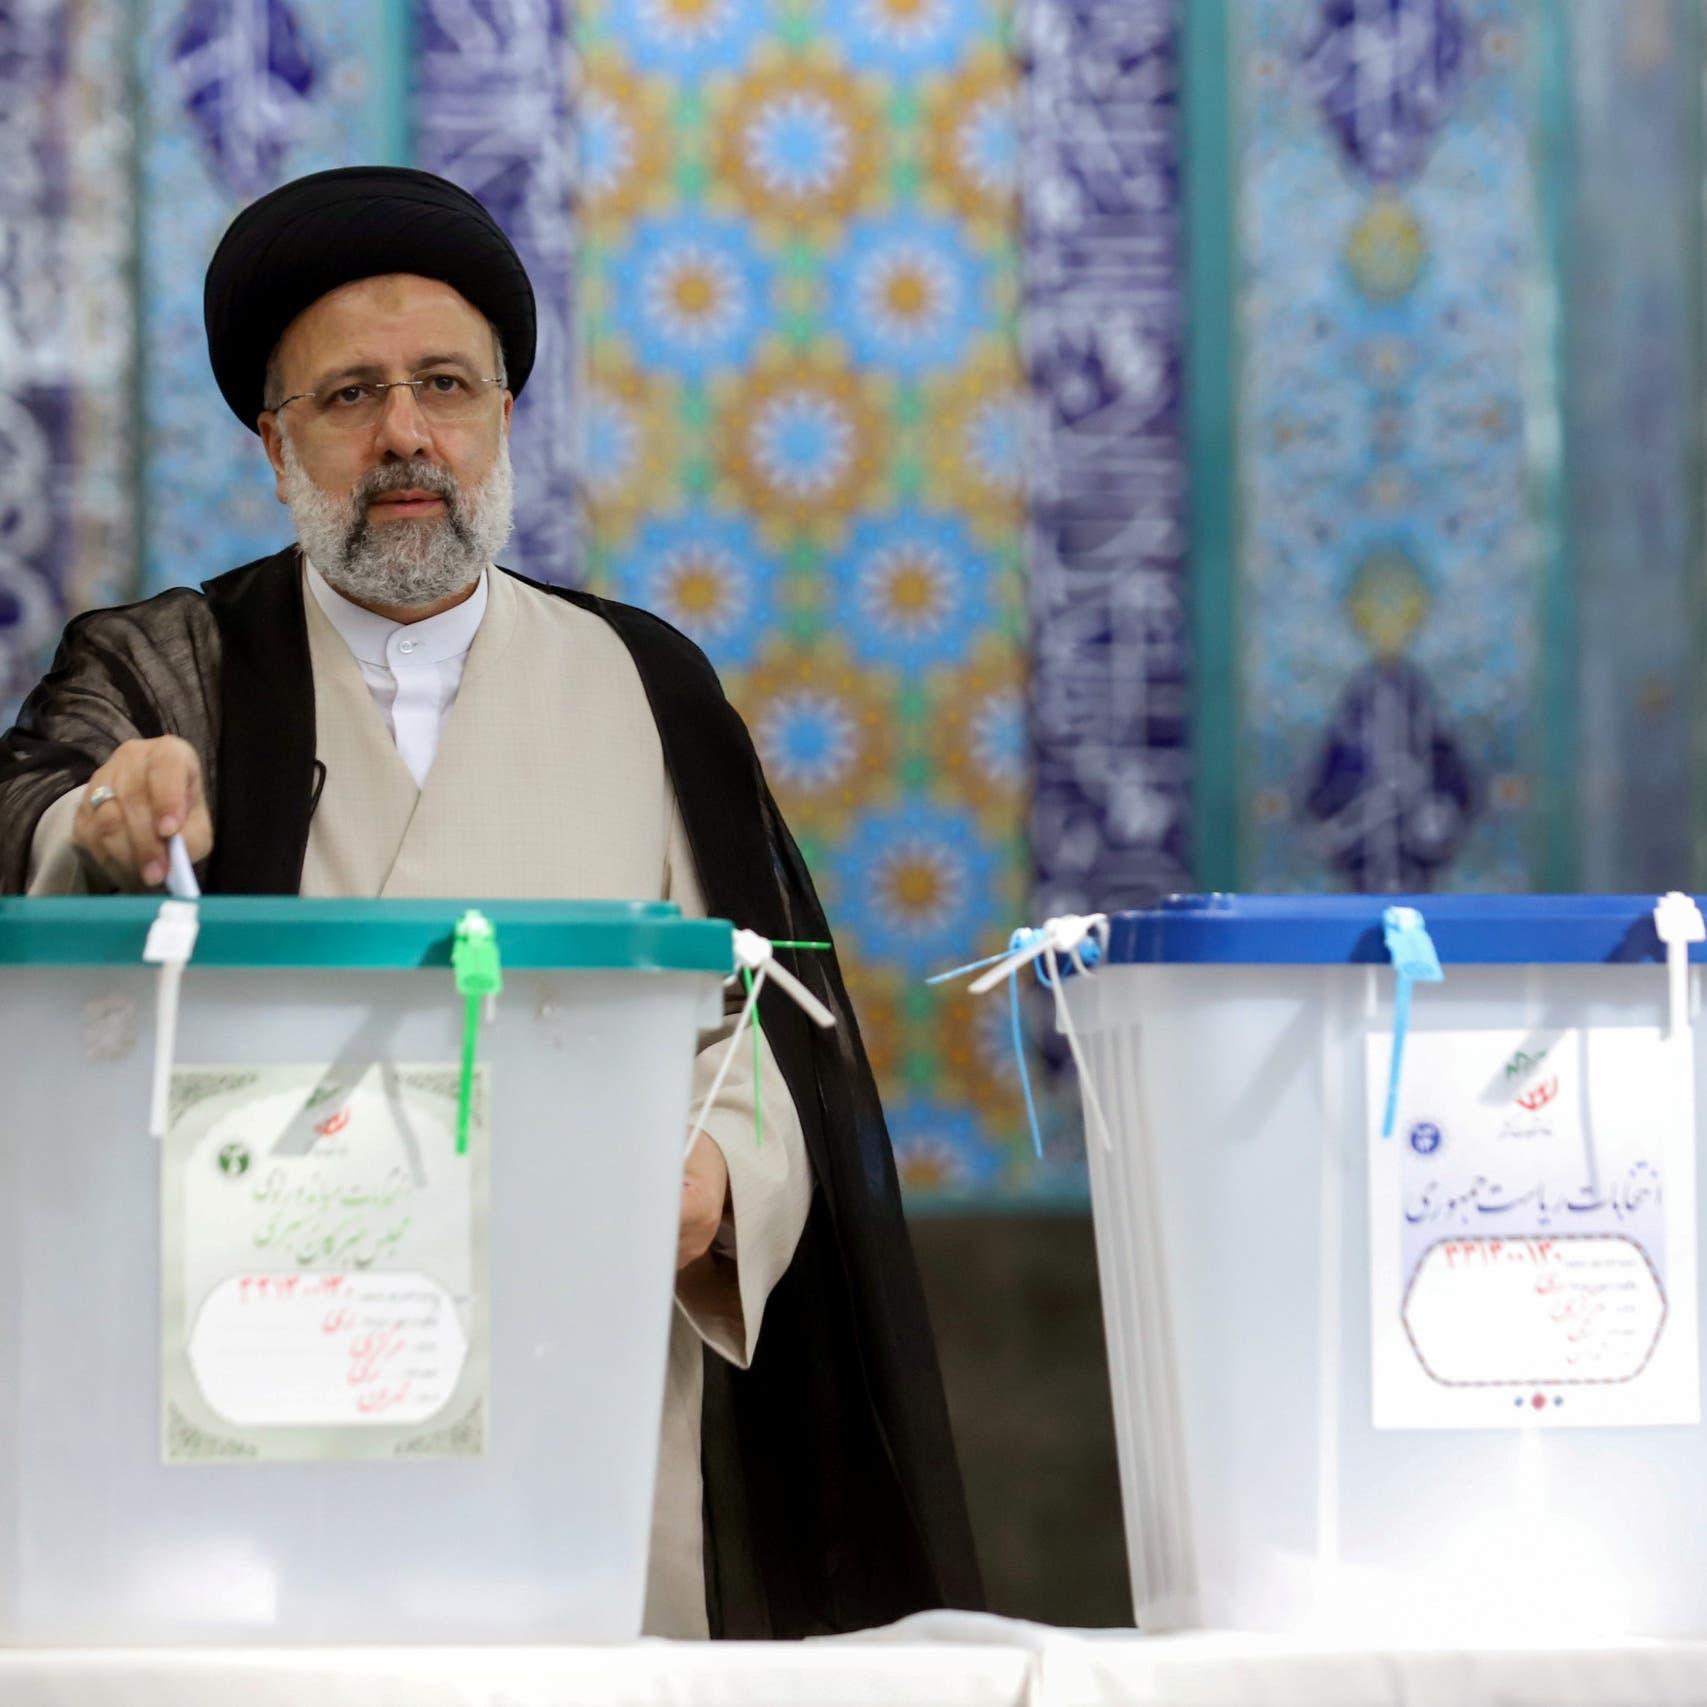 Iran elections: Ebrahim Raisi, judge under US sanctions, set to take over presidency